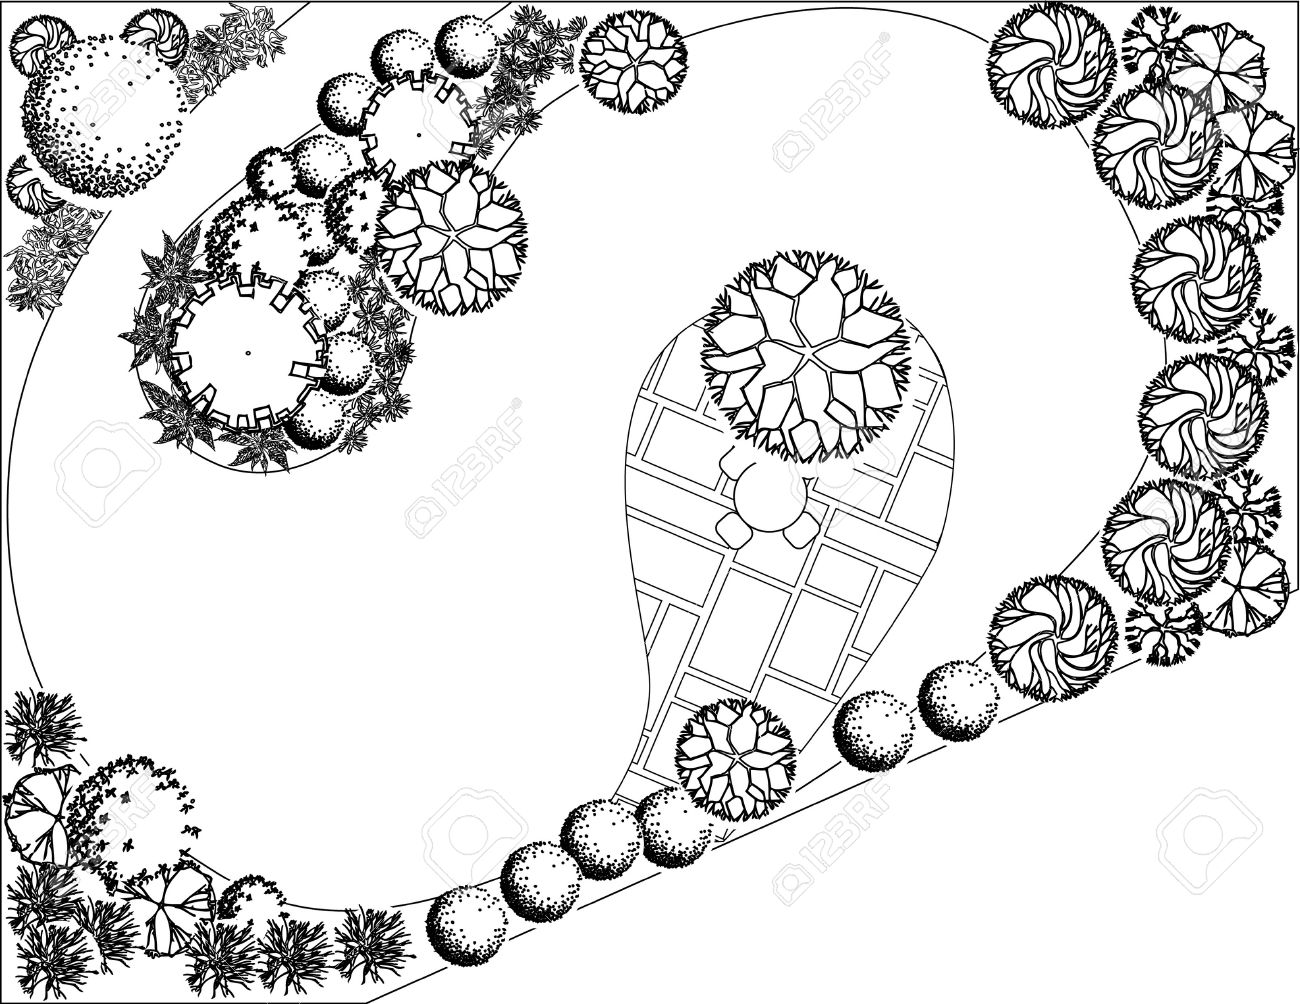 Blueprint Wiring Symbol